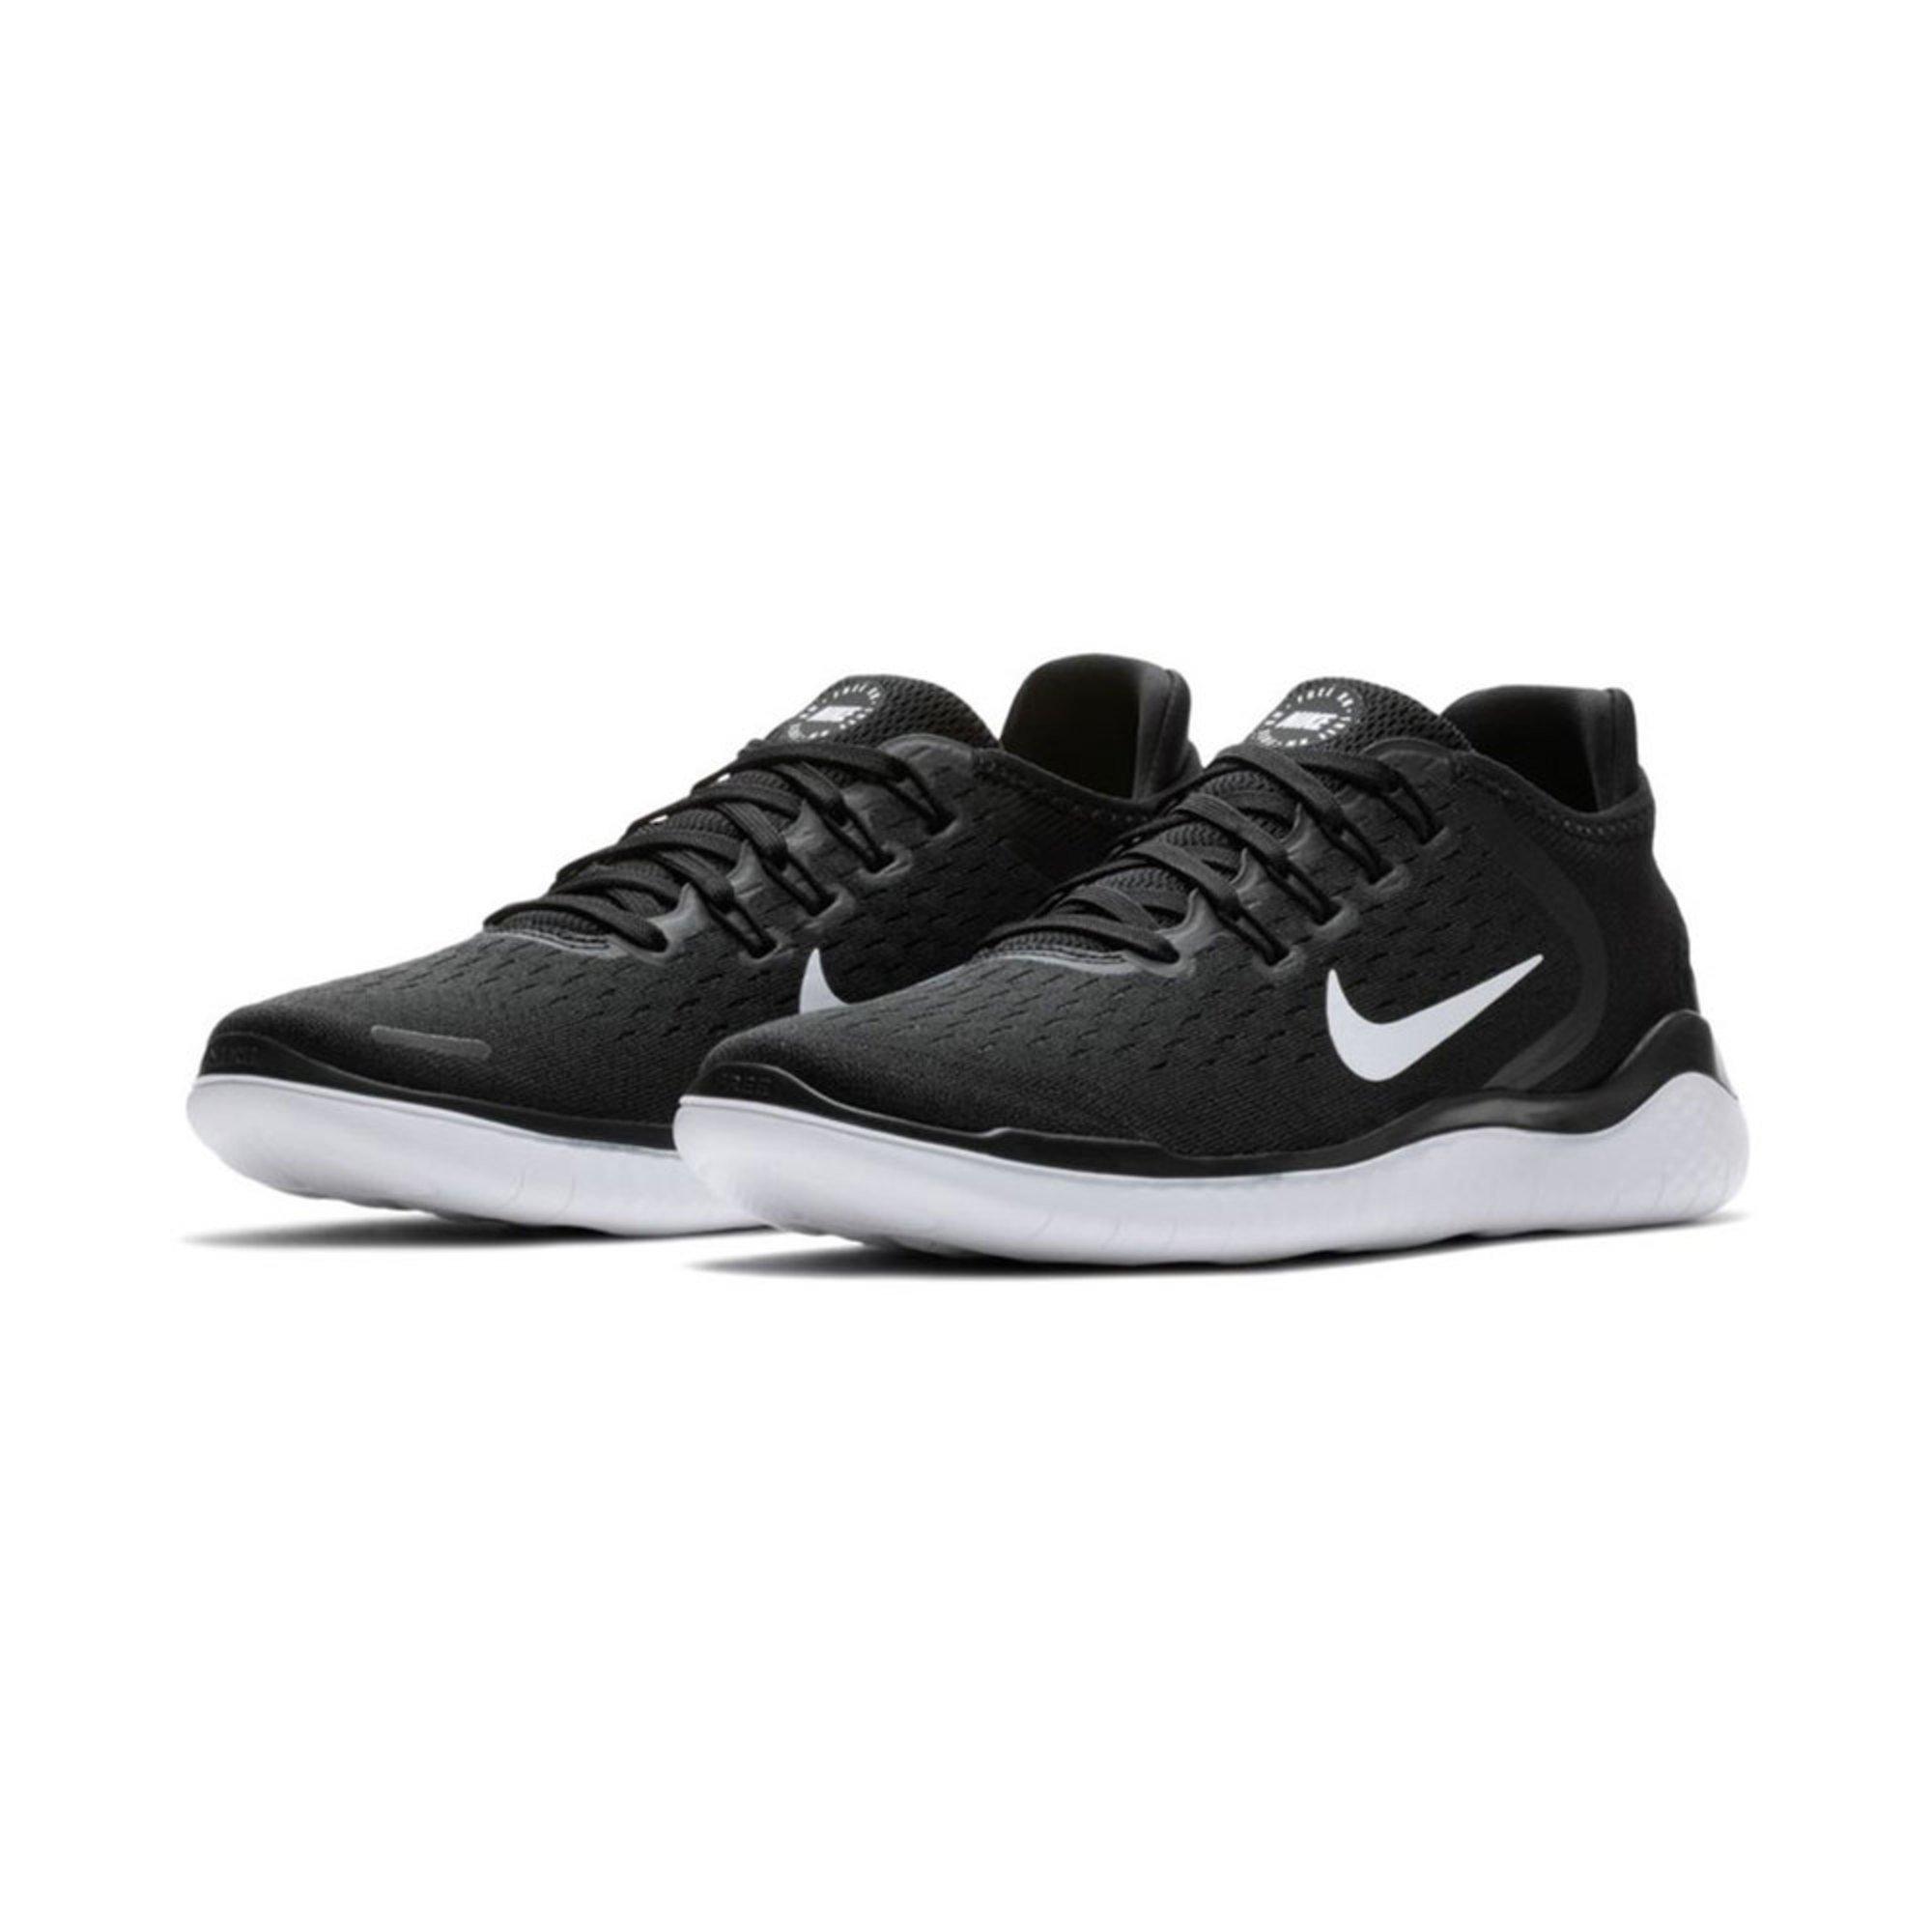 Nike Free Rn 2018 Id Examiner Votre Cas vente au rabais tumblr de sortie m2CUS9MCxl